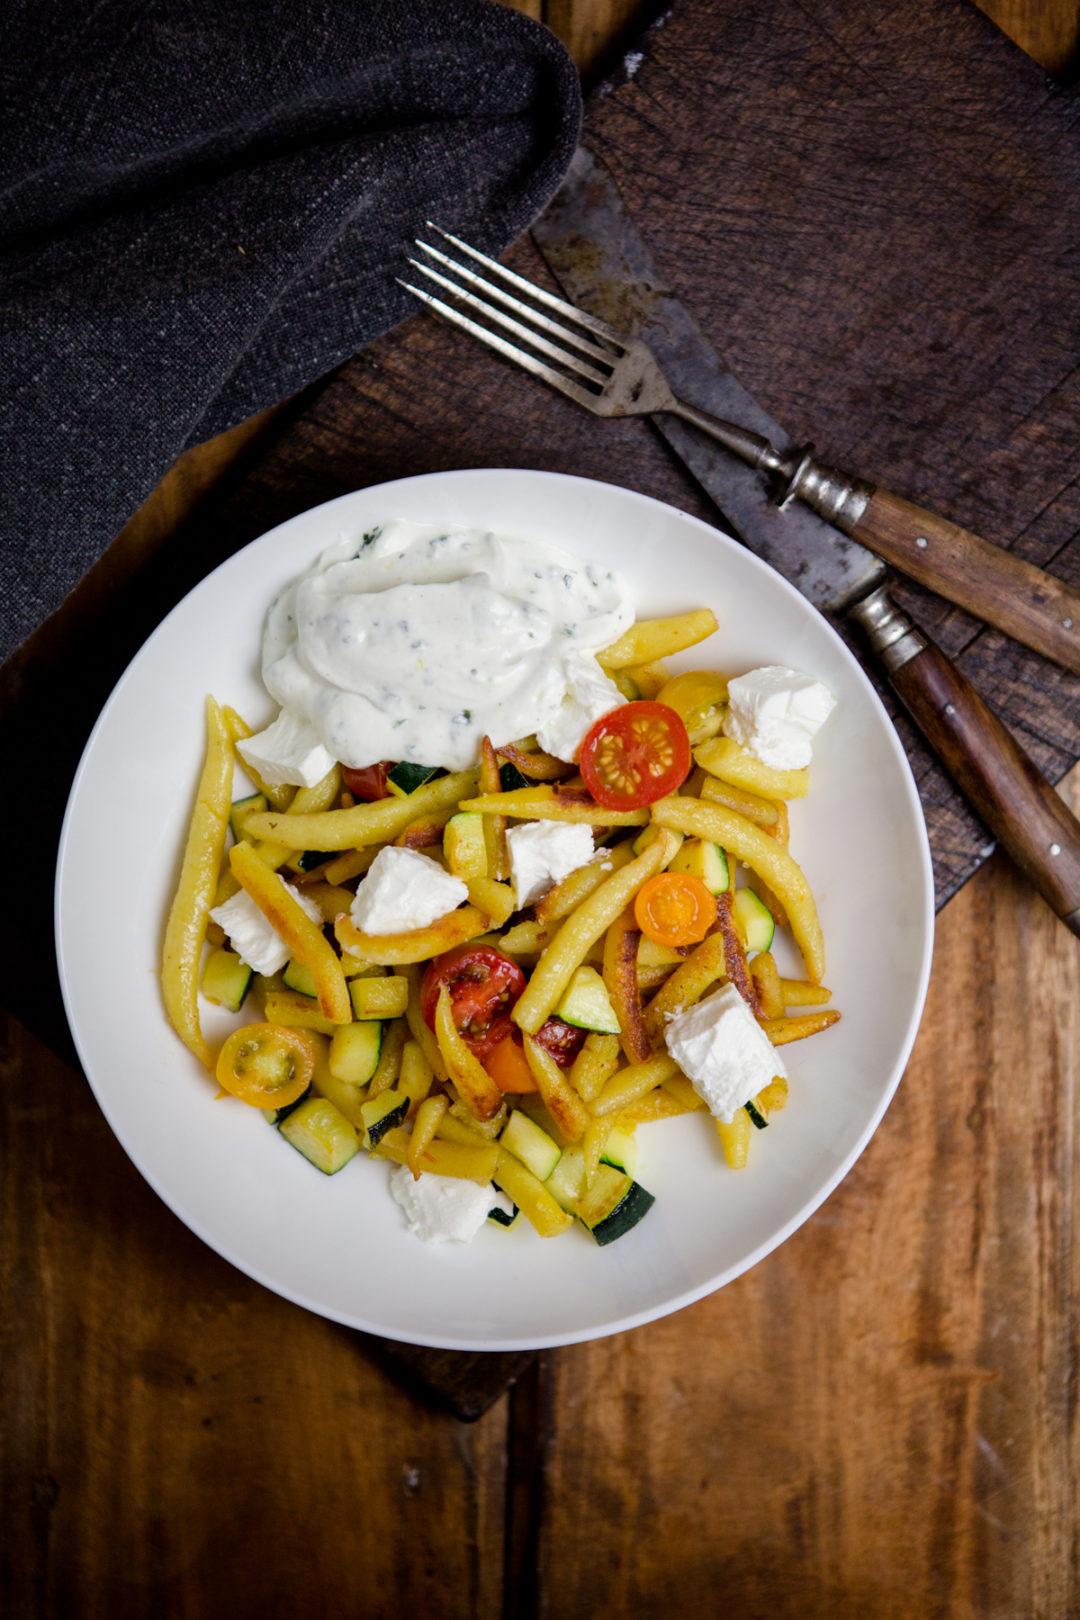 Schupfnudelpfanne mit Gemüse, Feta und Joghurt-Kräutersauce - http://kuechenchaotin.de